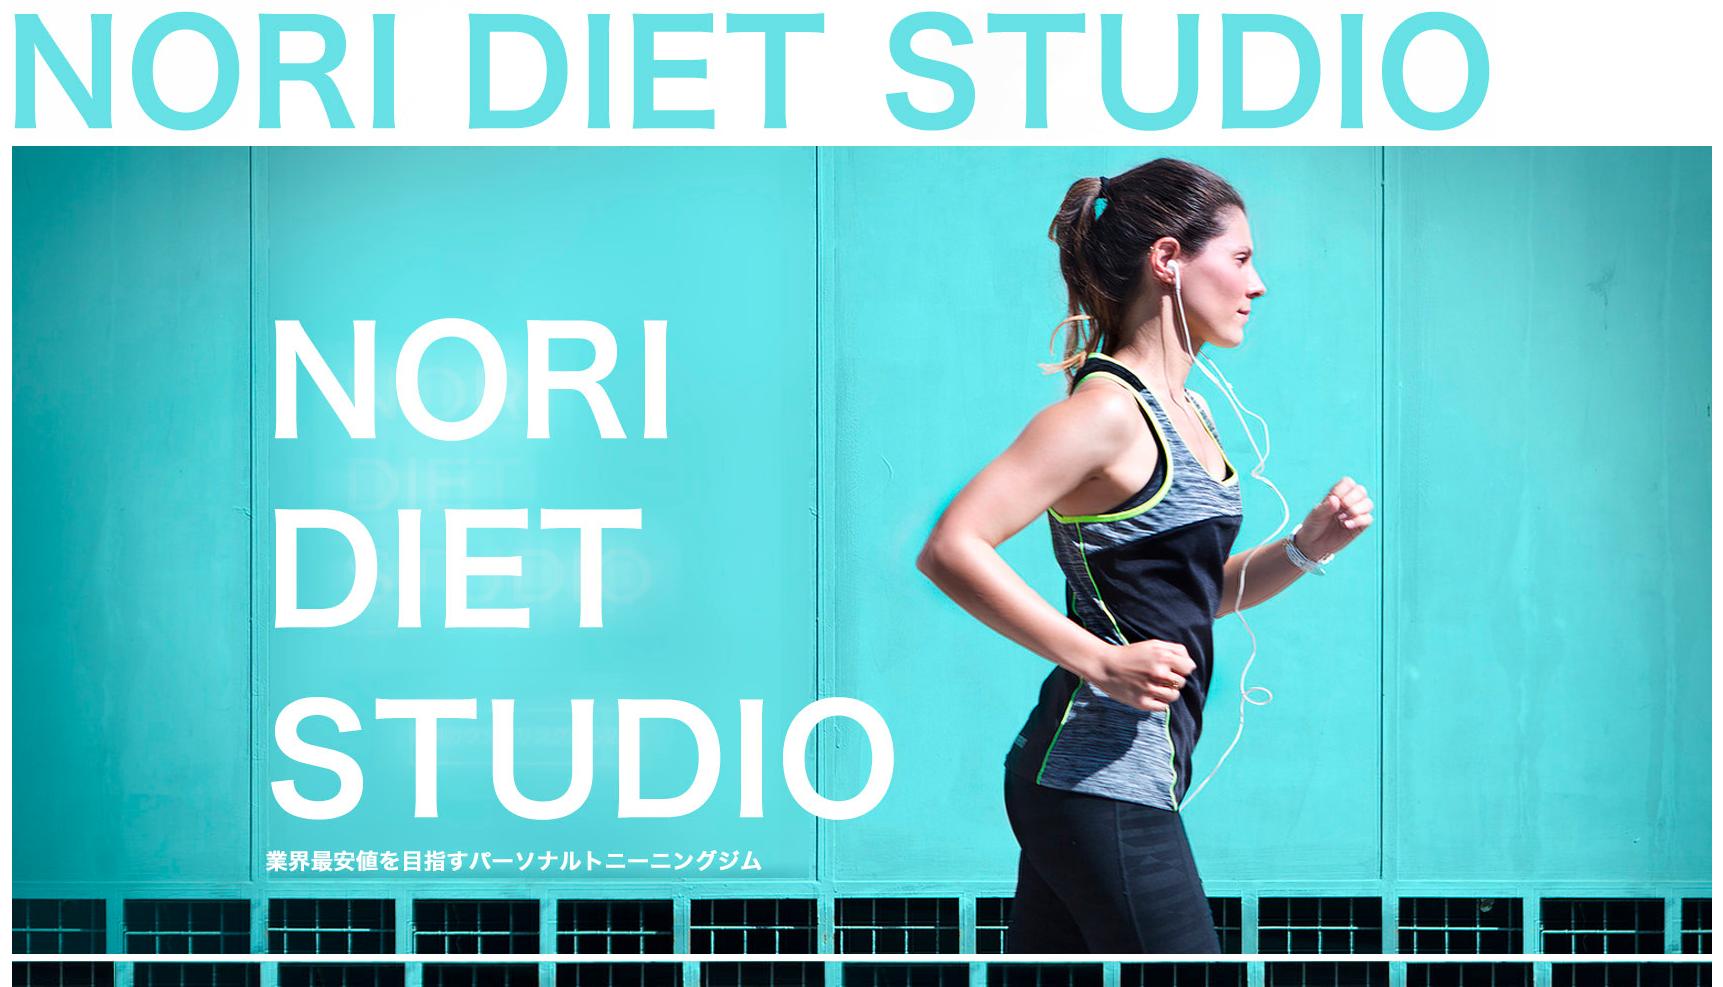 NORI DIET STUDIOは 東京都台東区東上野にあるダイエット、 筋力増強、姿勢改善、健康維持をメインに行う 完全マンツーマンのトレーニングスタジオです。 十人十色の生活習慣、既往歴、持病、 姿勢に基づいた適正負荷、適正種目、適正フォームで 安全に楽しく引き締まった身体を手に入れられることが出来ます。 食事指導に関しては栄養に関する最新の知識、 立証されている科学的根拠を基に無理なく 痩せられるアドバイスを実施致します。